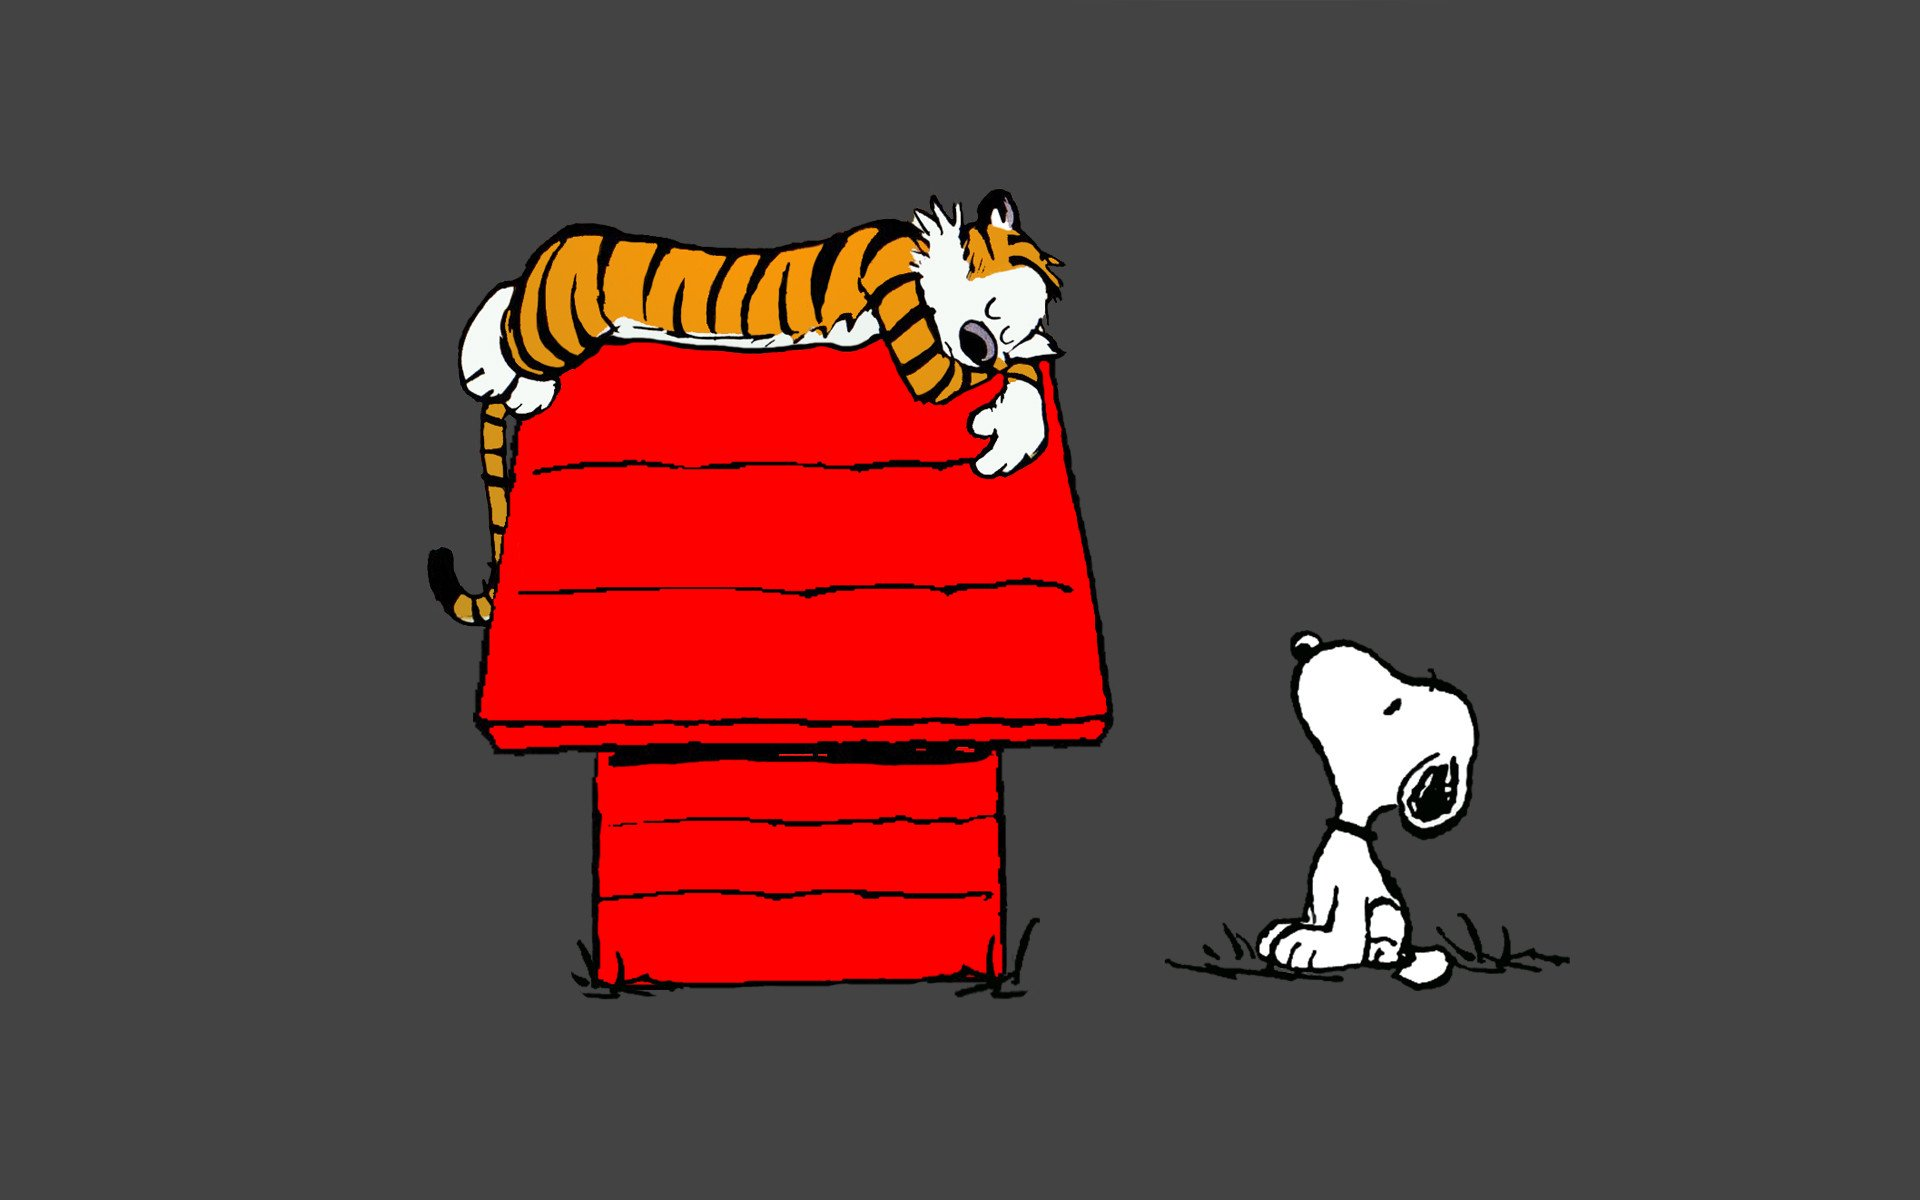 [49+] Calvin and Hobbes Wallpaper Widescreen on ...